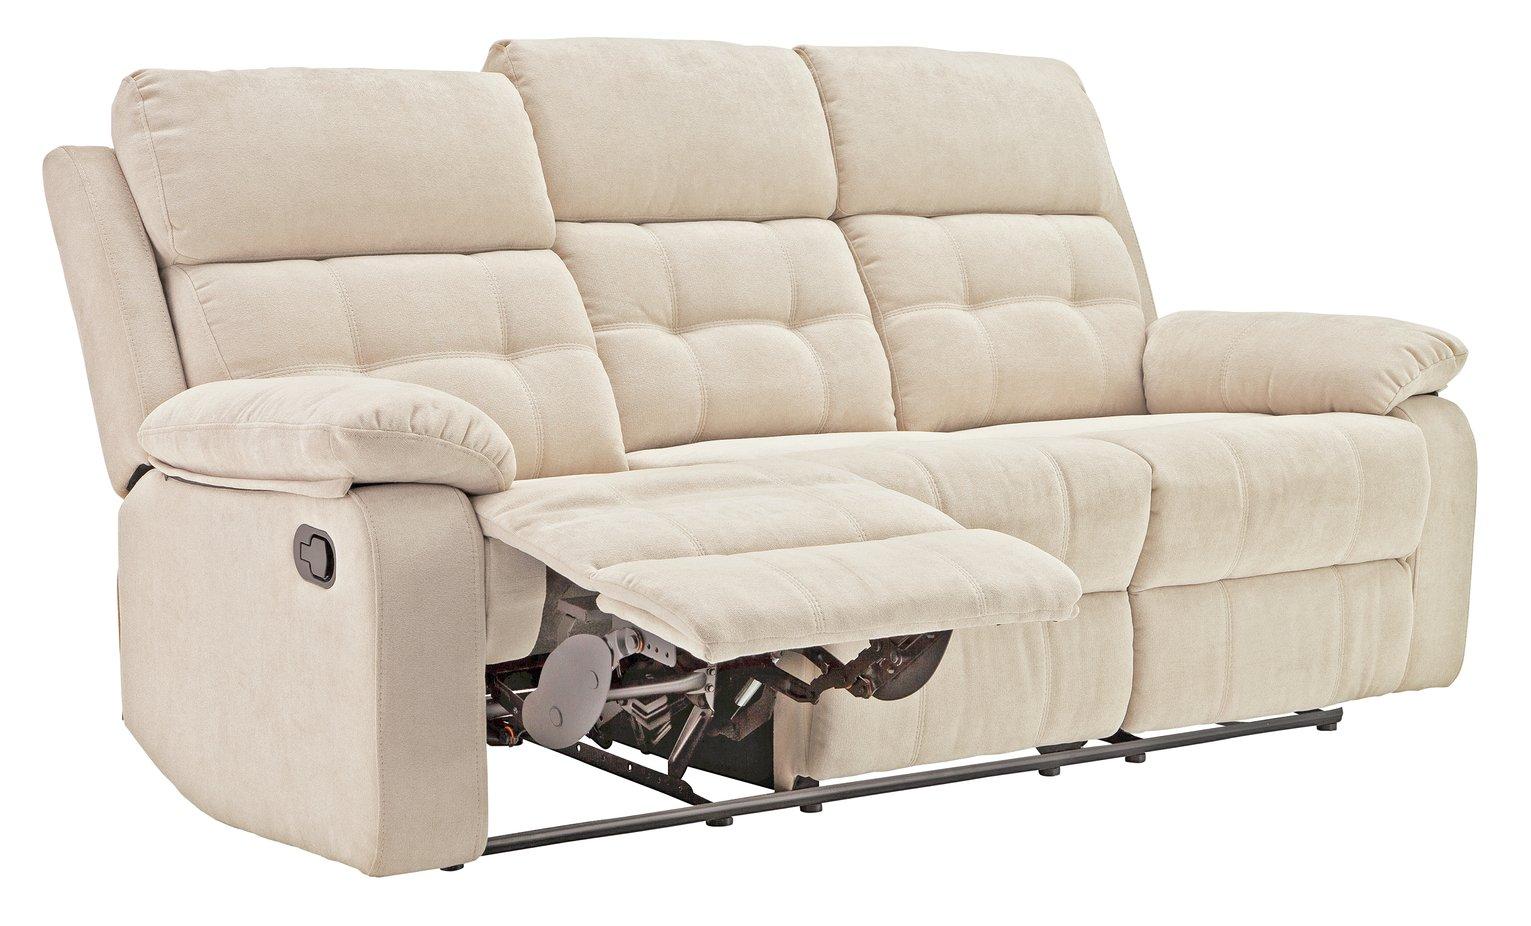 Argos Home June 3 Seater Fabric Recliner Sofa - Natural